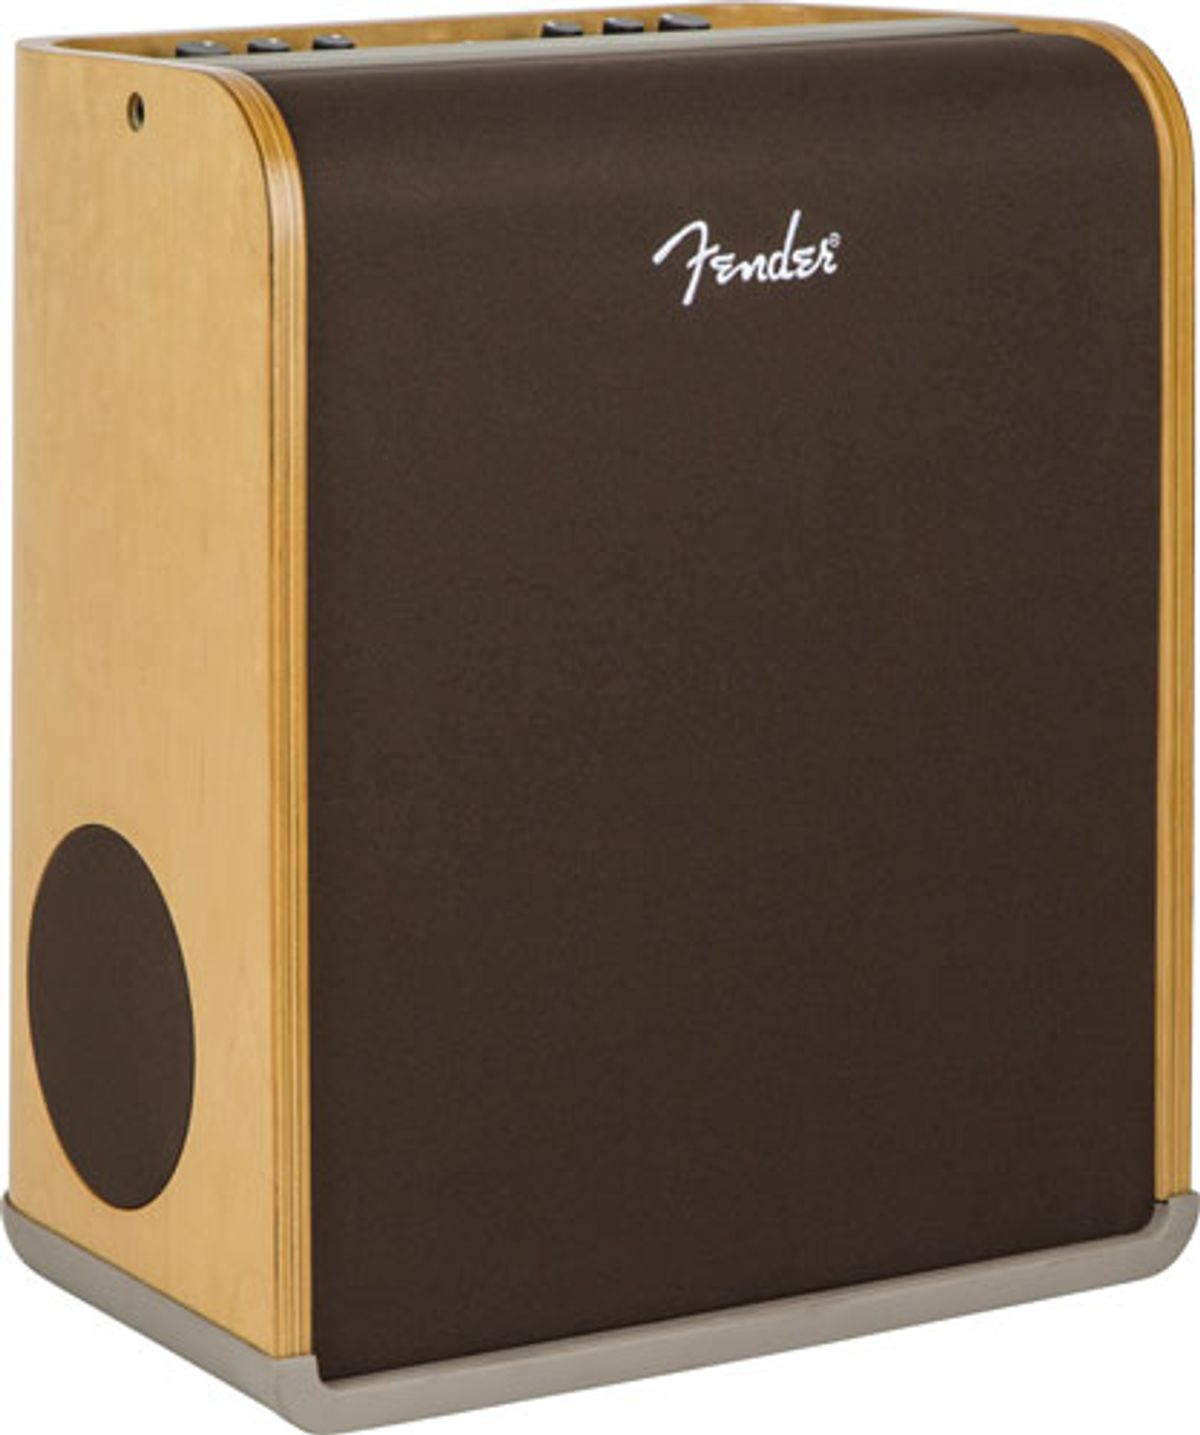 Fender Announces the Acoustic Pro and Acoustic SFX Amplifiers